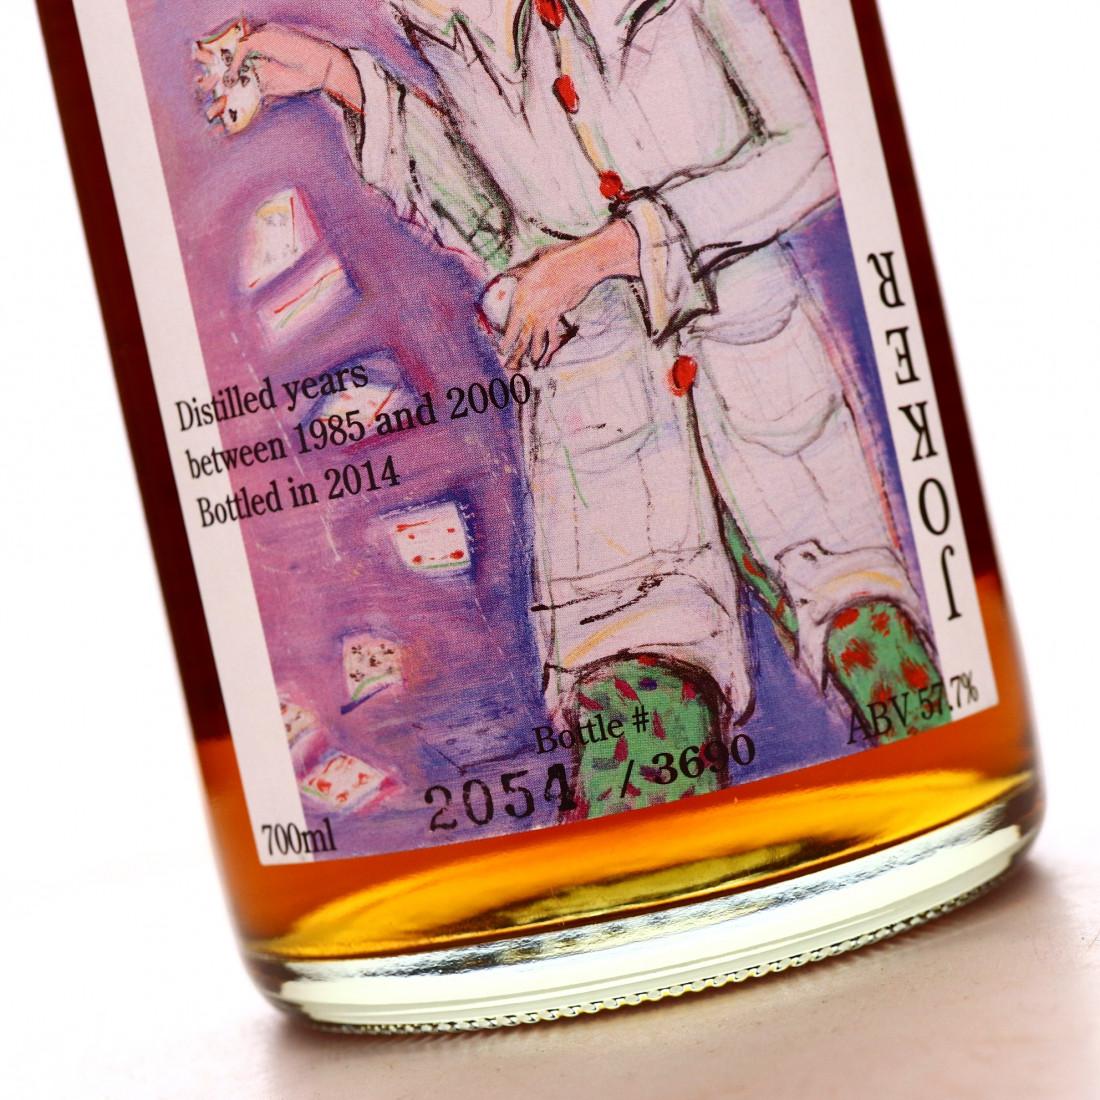 Hanyu Ichiro's Malt 'Card' / The Joker 'Colour'